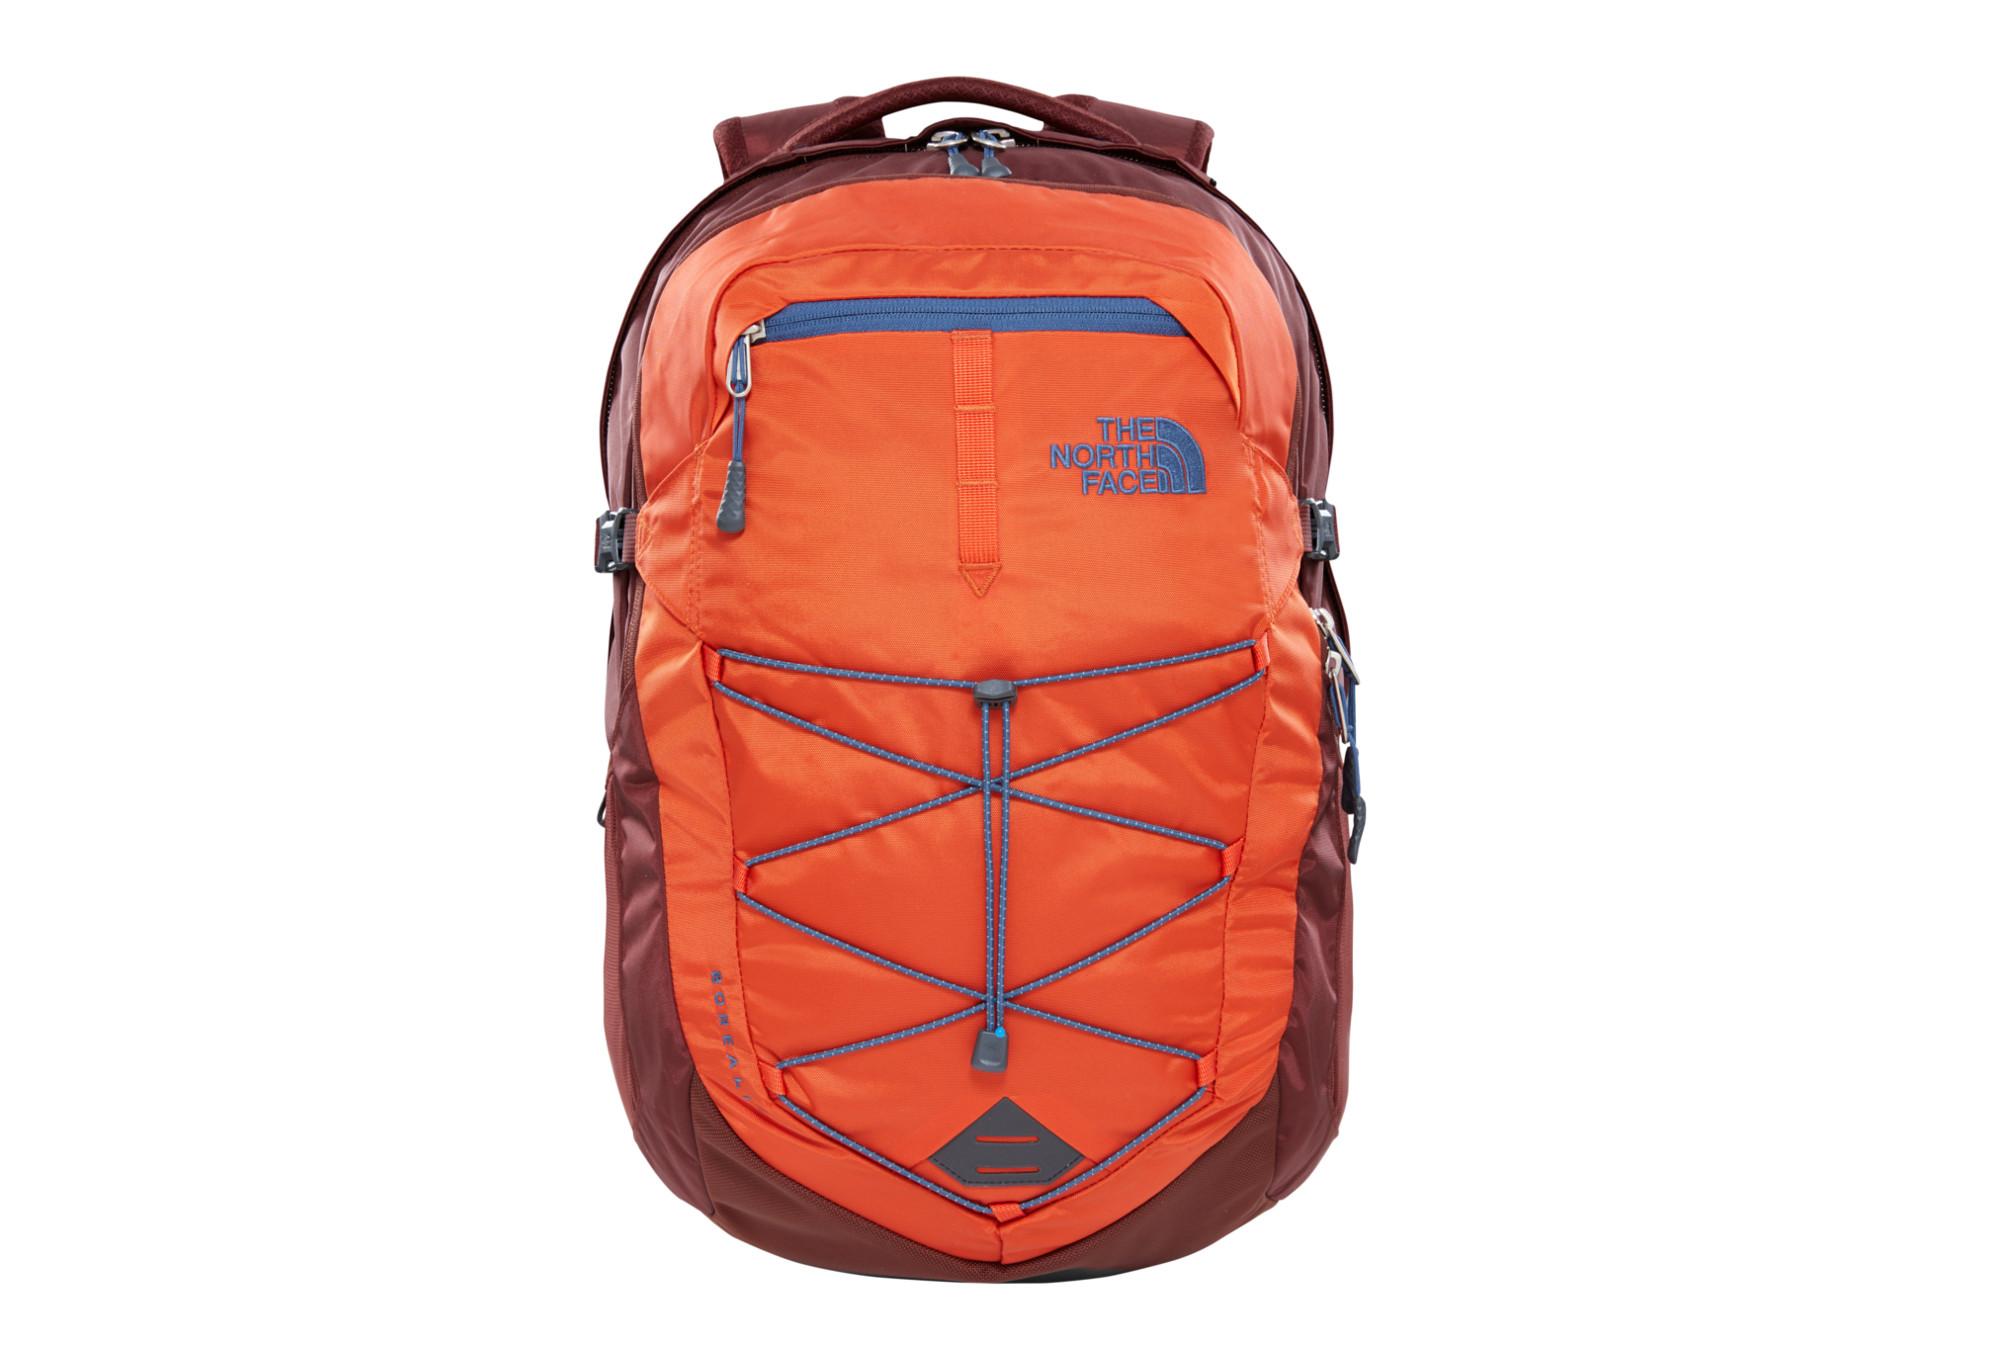 sac dos the north face borealis orange. Black Bedroom Furniture Sets. Home Design Ideas